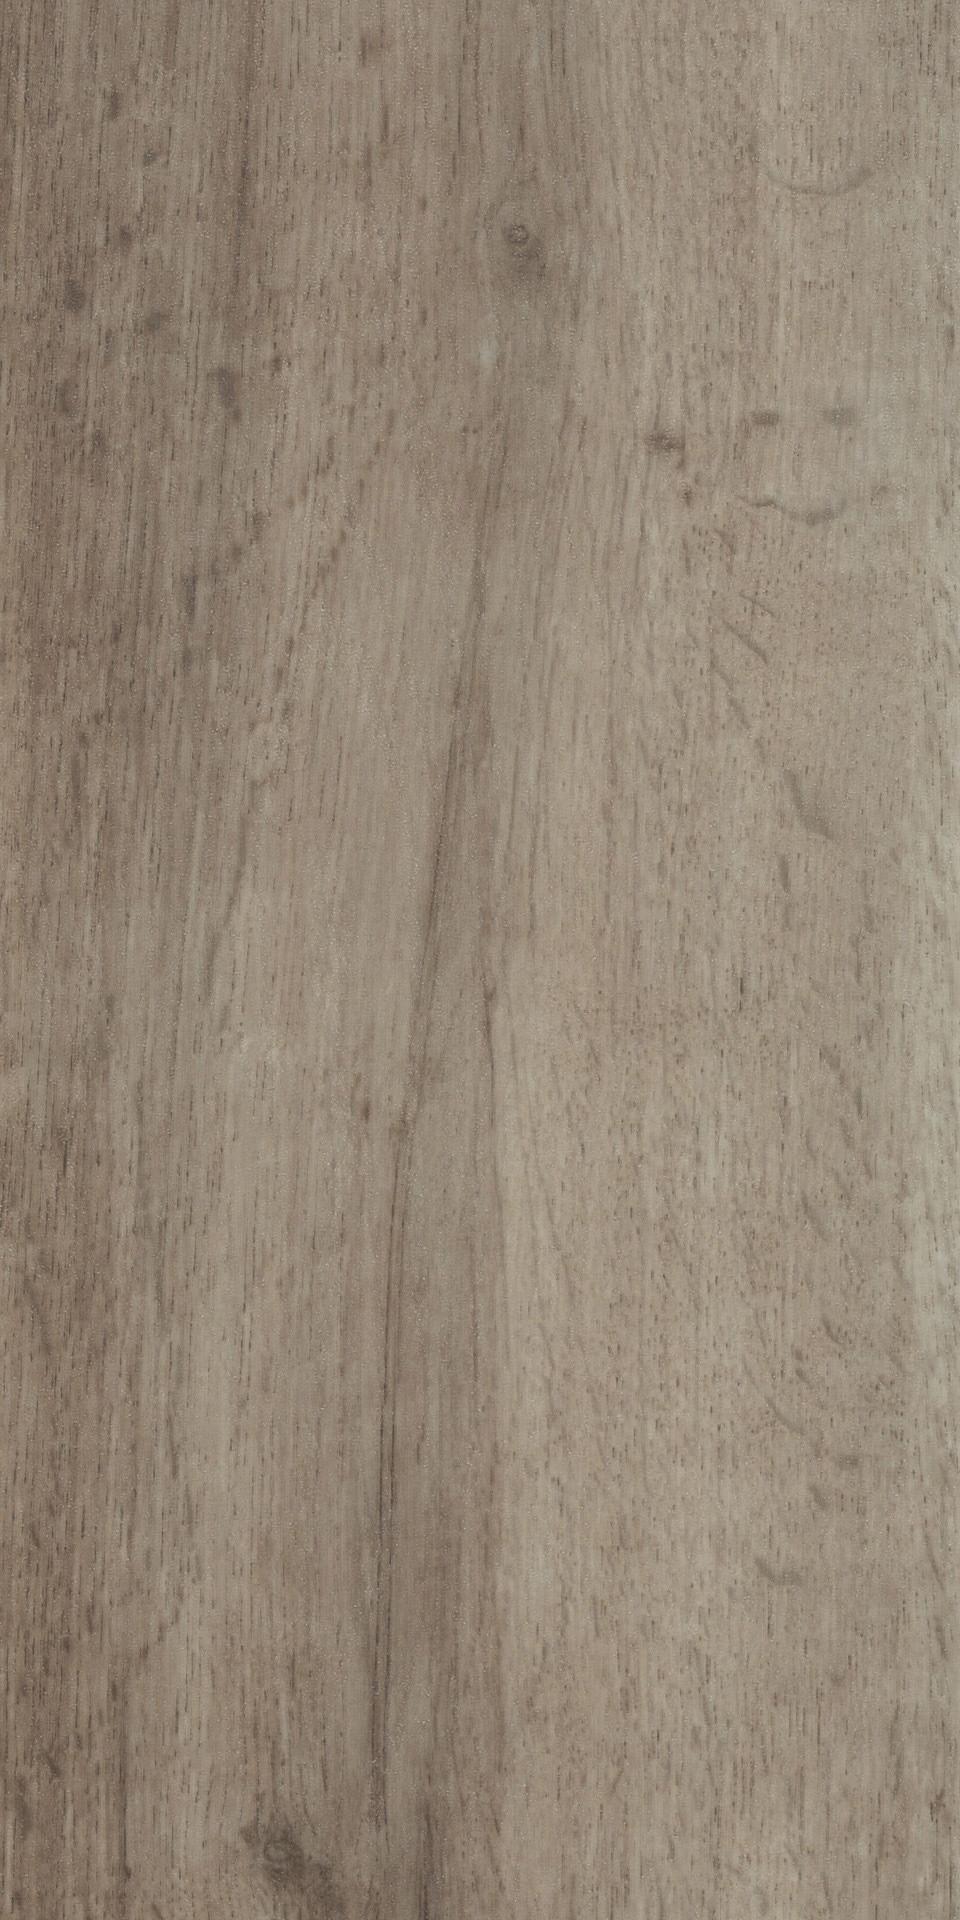 white oak grey hardwood flooring of 26 unique grey hardwood floors photos flooring design ideas regarding grey hardwood floors best of forbo allura flex 0 55 grey autumn oak selbstliegender vinylboden images